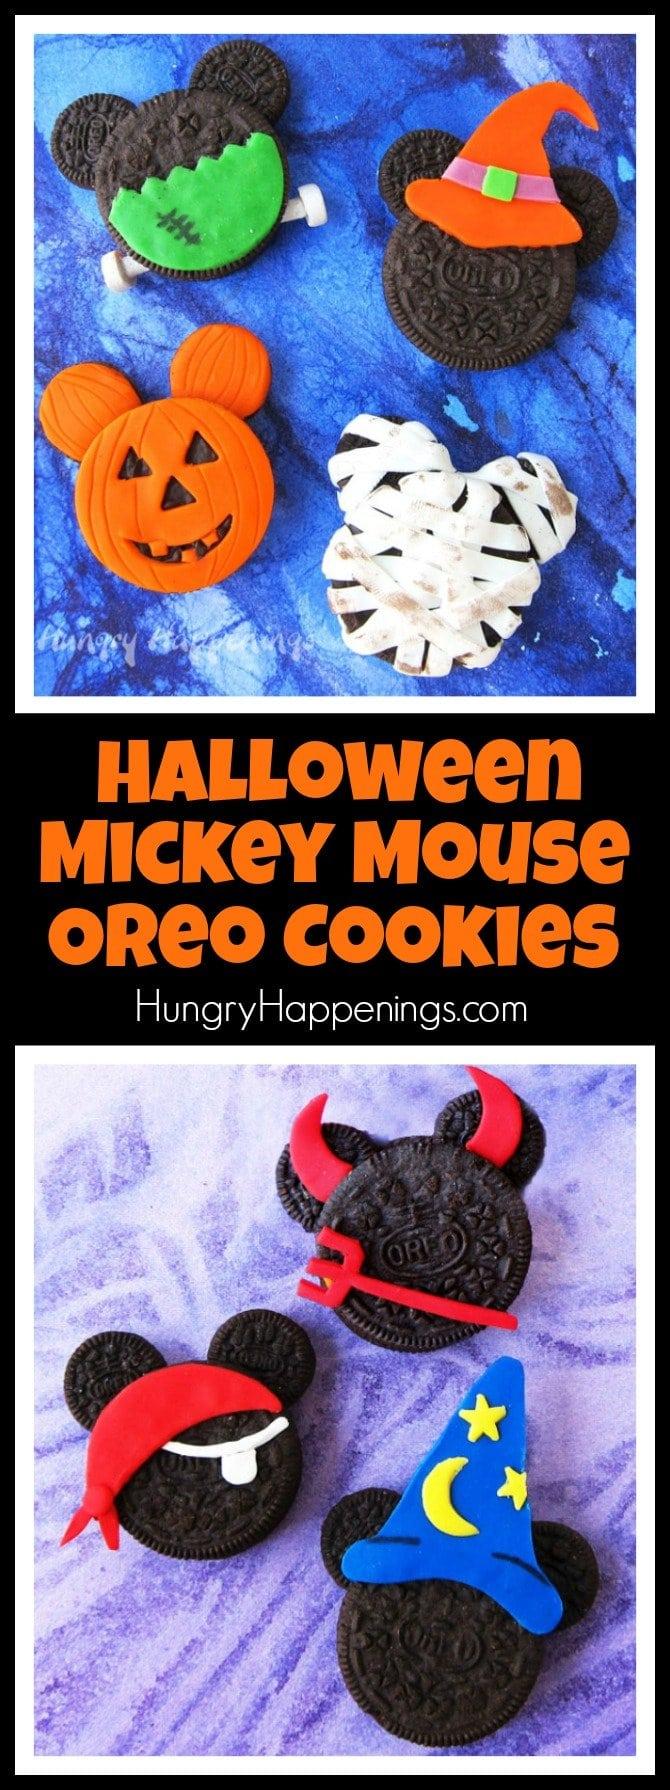 Halloween Mickey Mouse Oreo Cookies